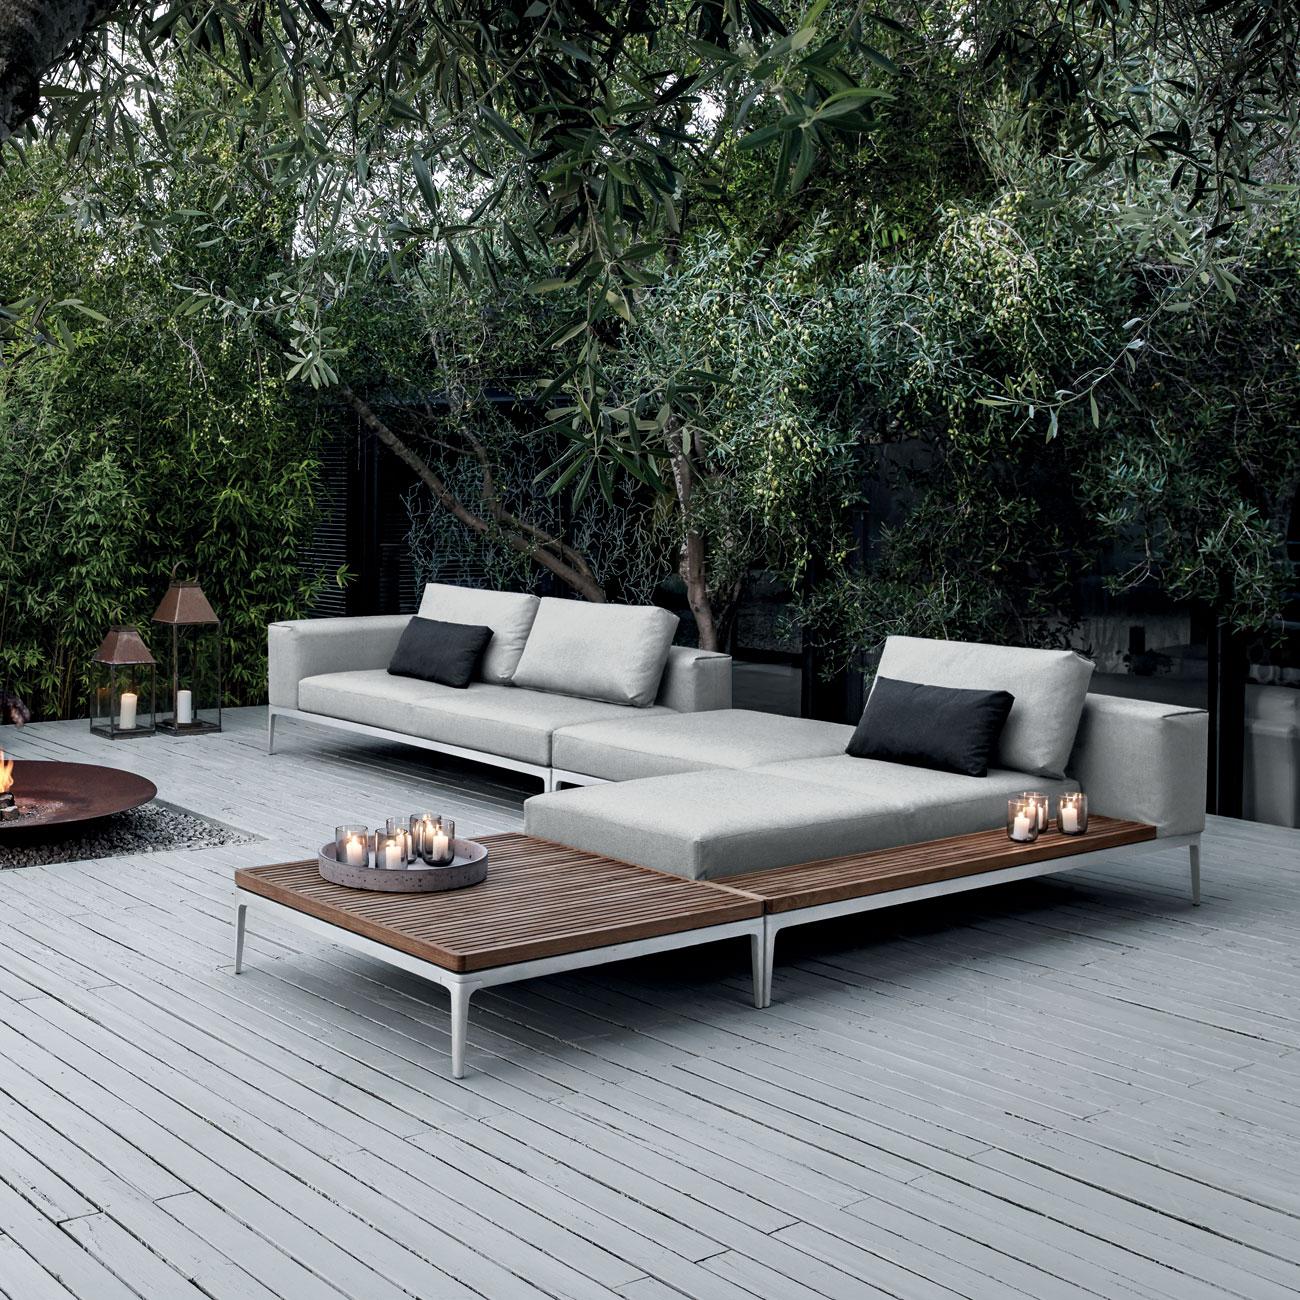 Gloster Grid Modular Sofa Ottoman Luxury Outdoor Living